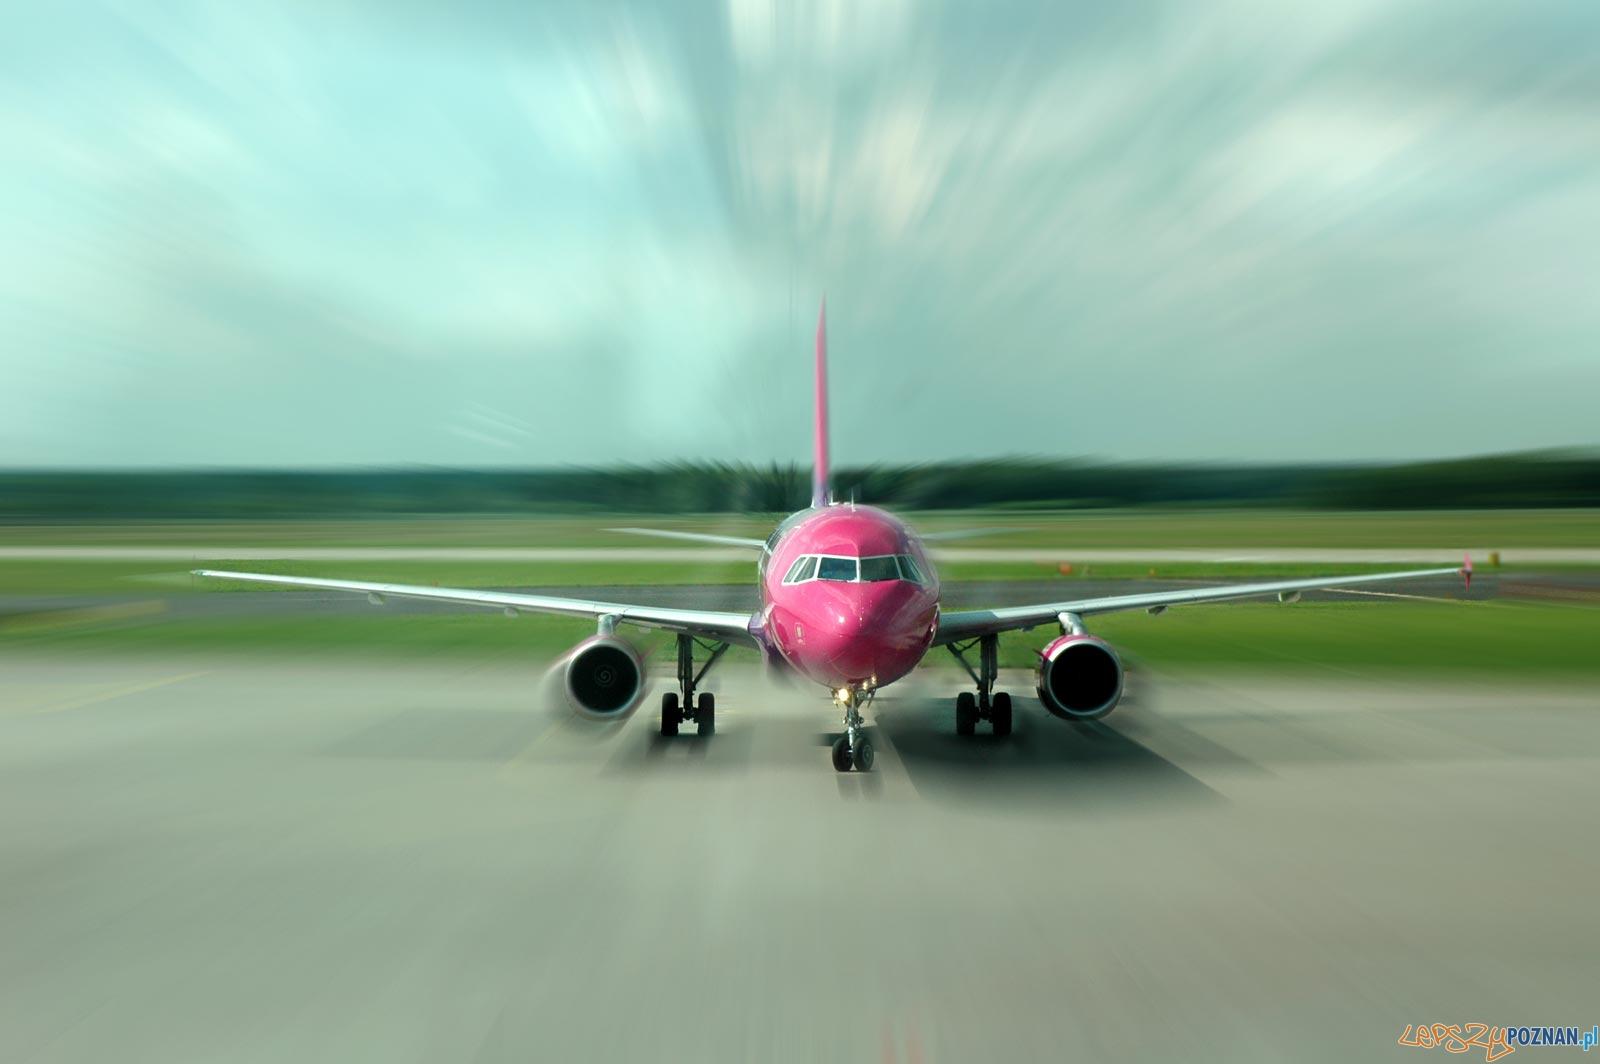 foto: wizzair - samolot  Foto: